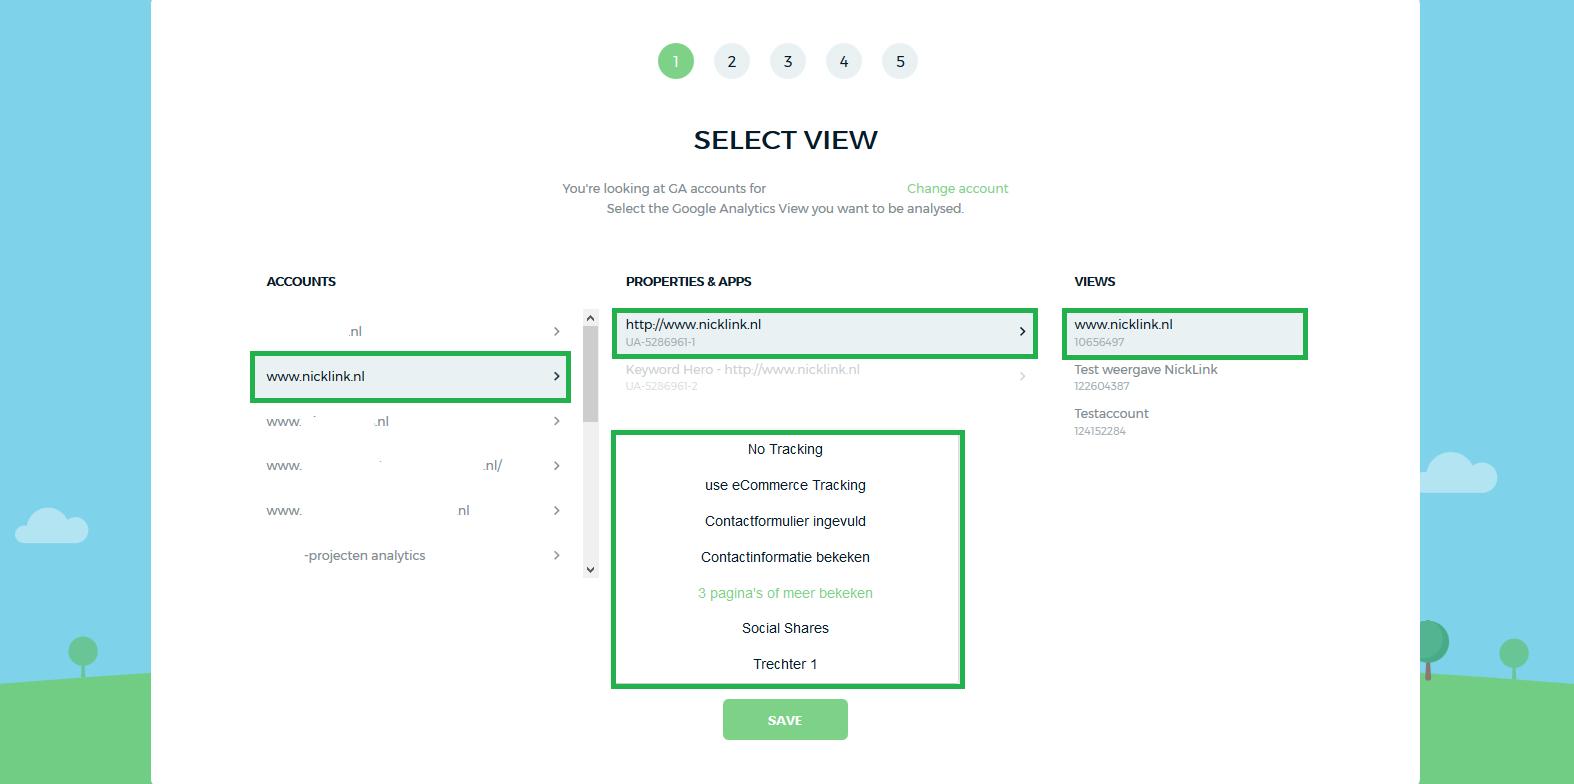 1e stap account maken Keyword Hero, kies account, property, view en doel